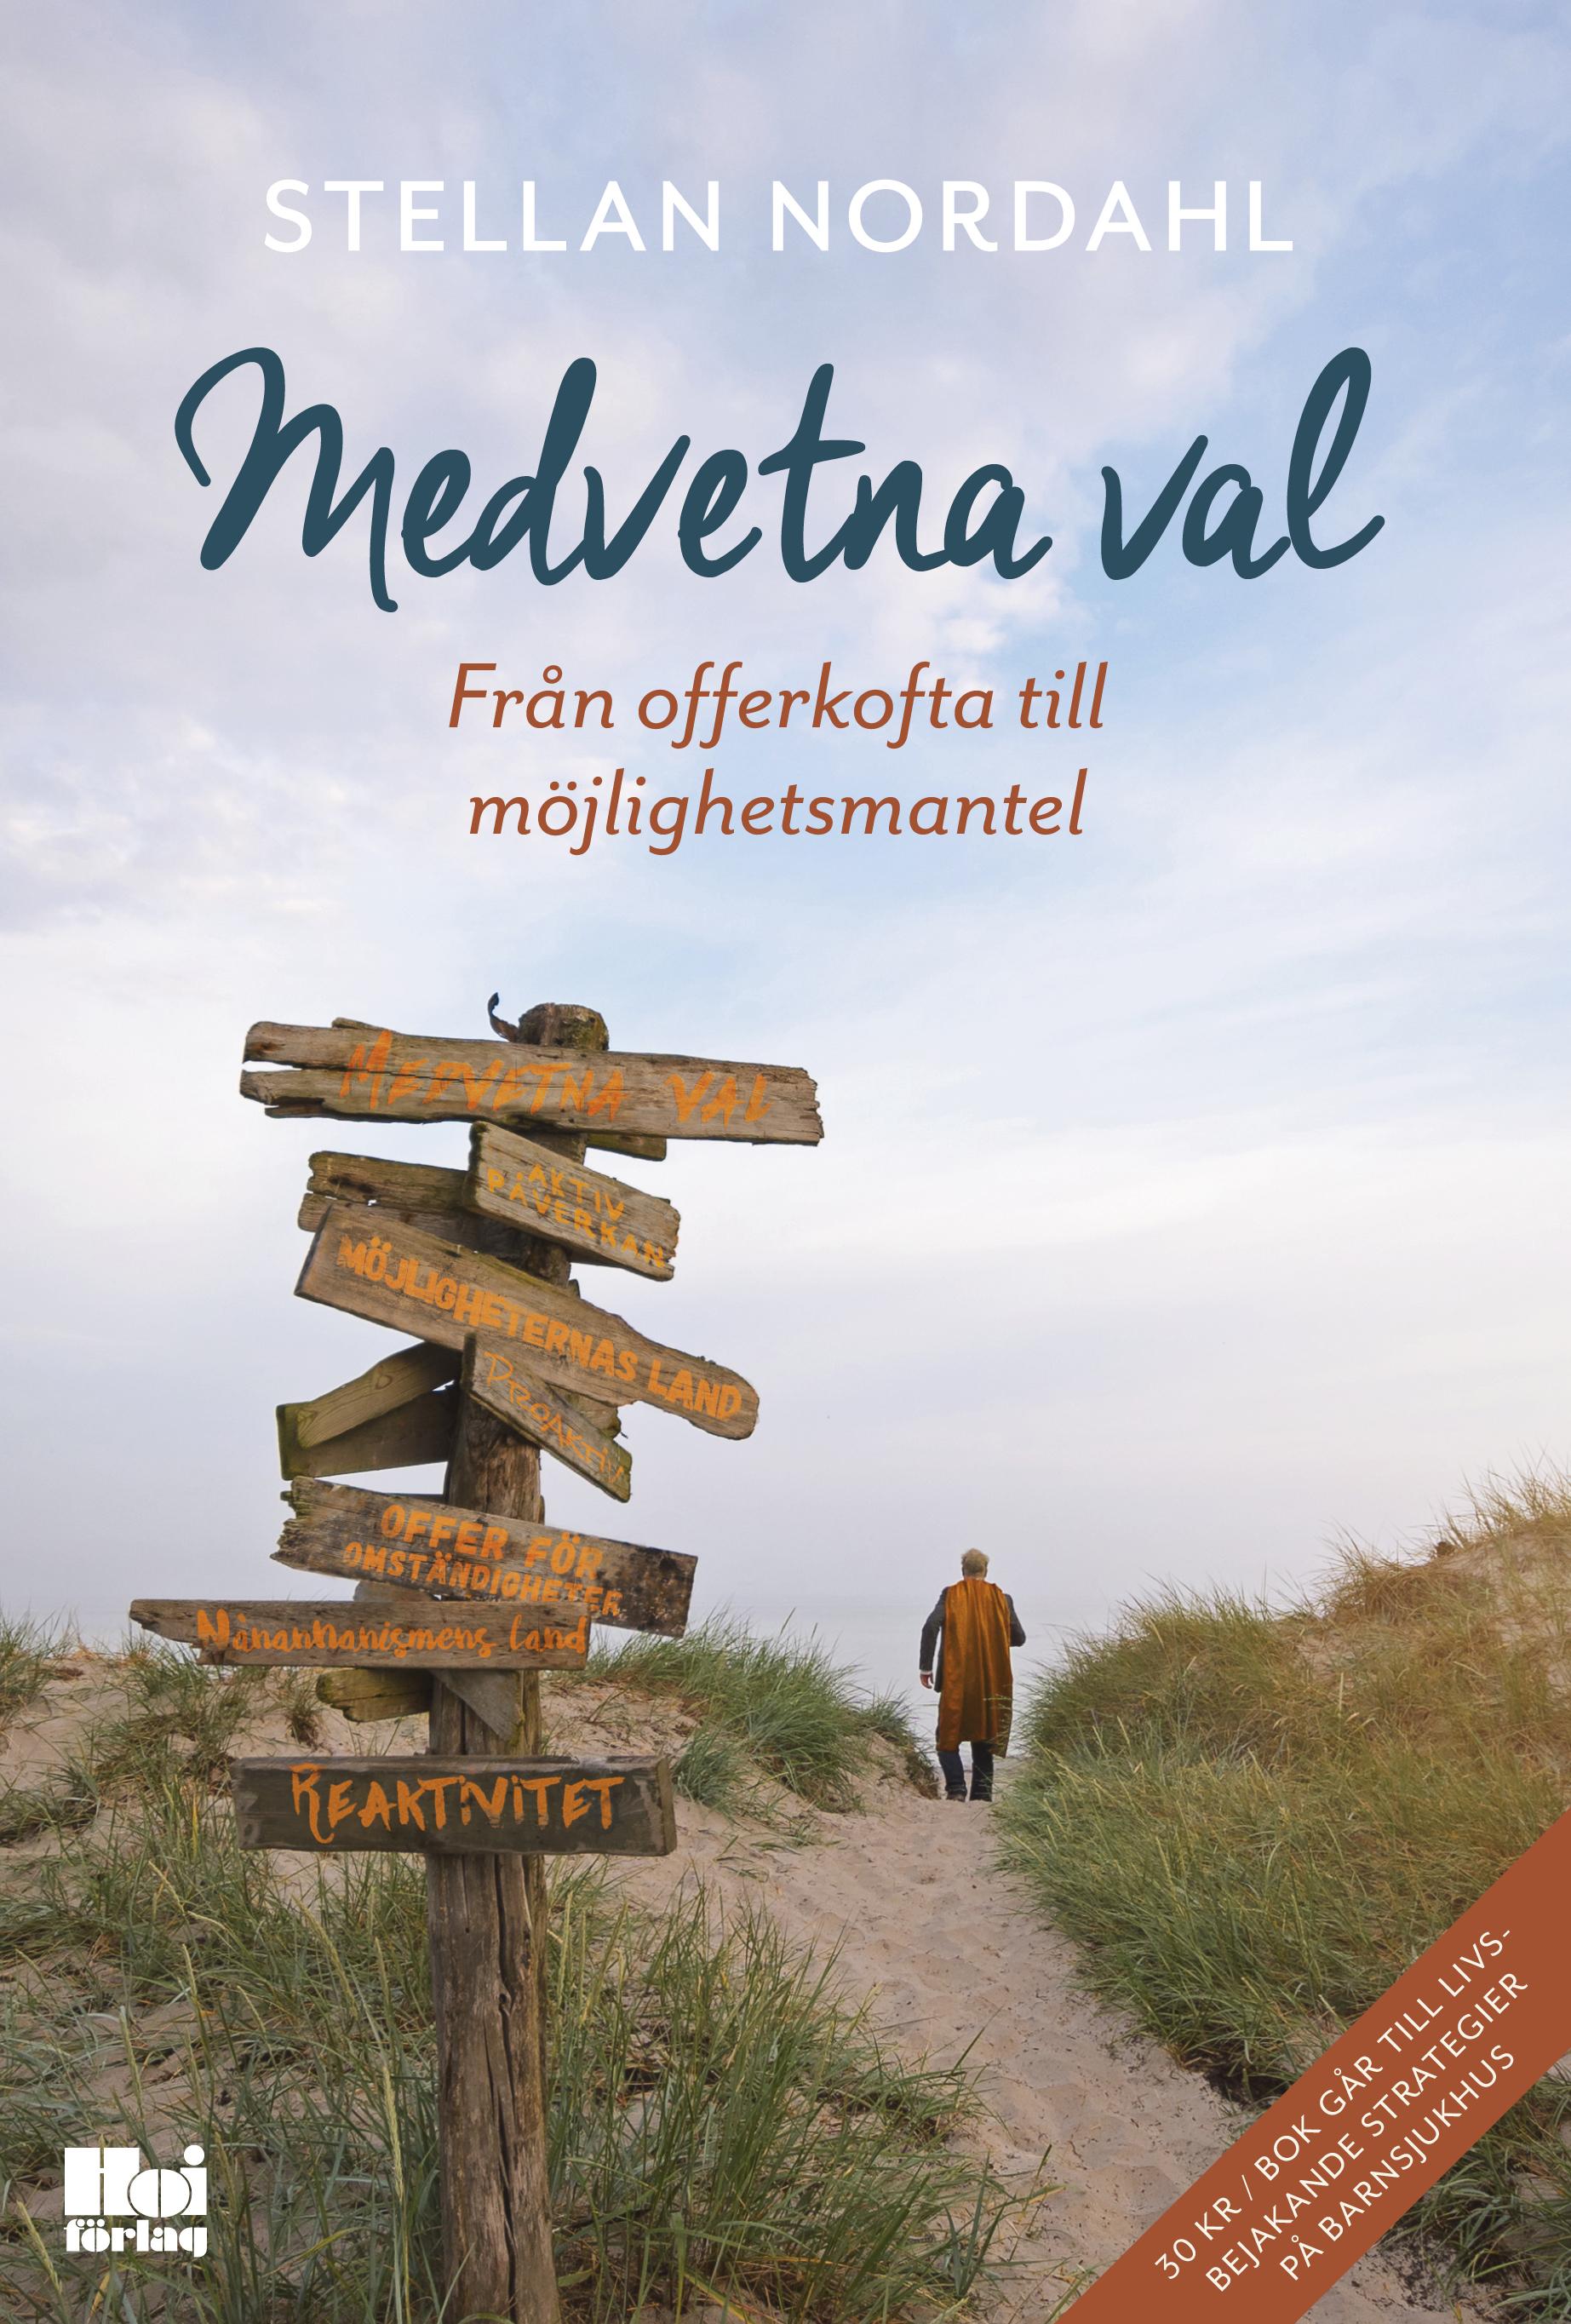 MEDVA_Medvetna val_Stellan Nordahl_omslag_web_jpg.jpg